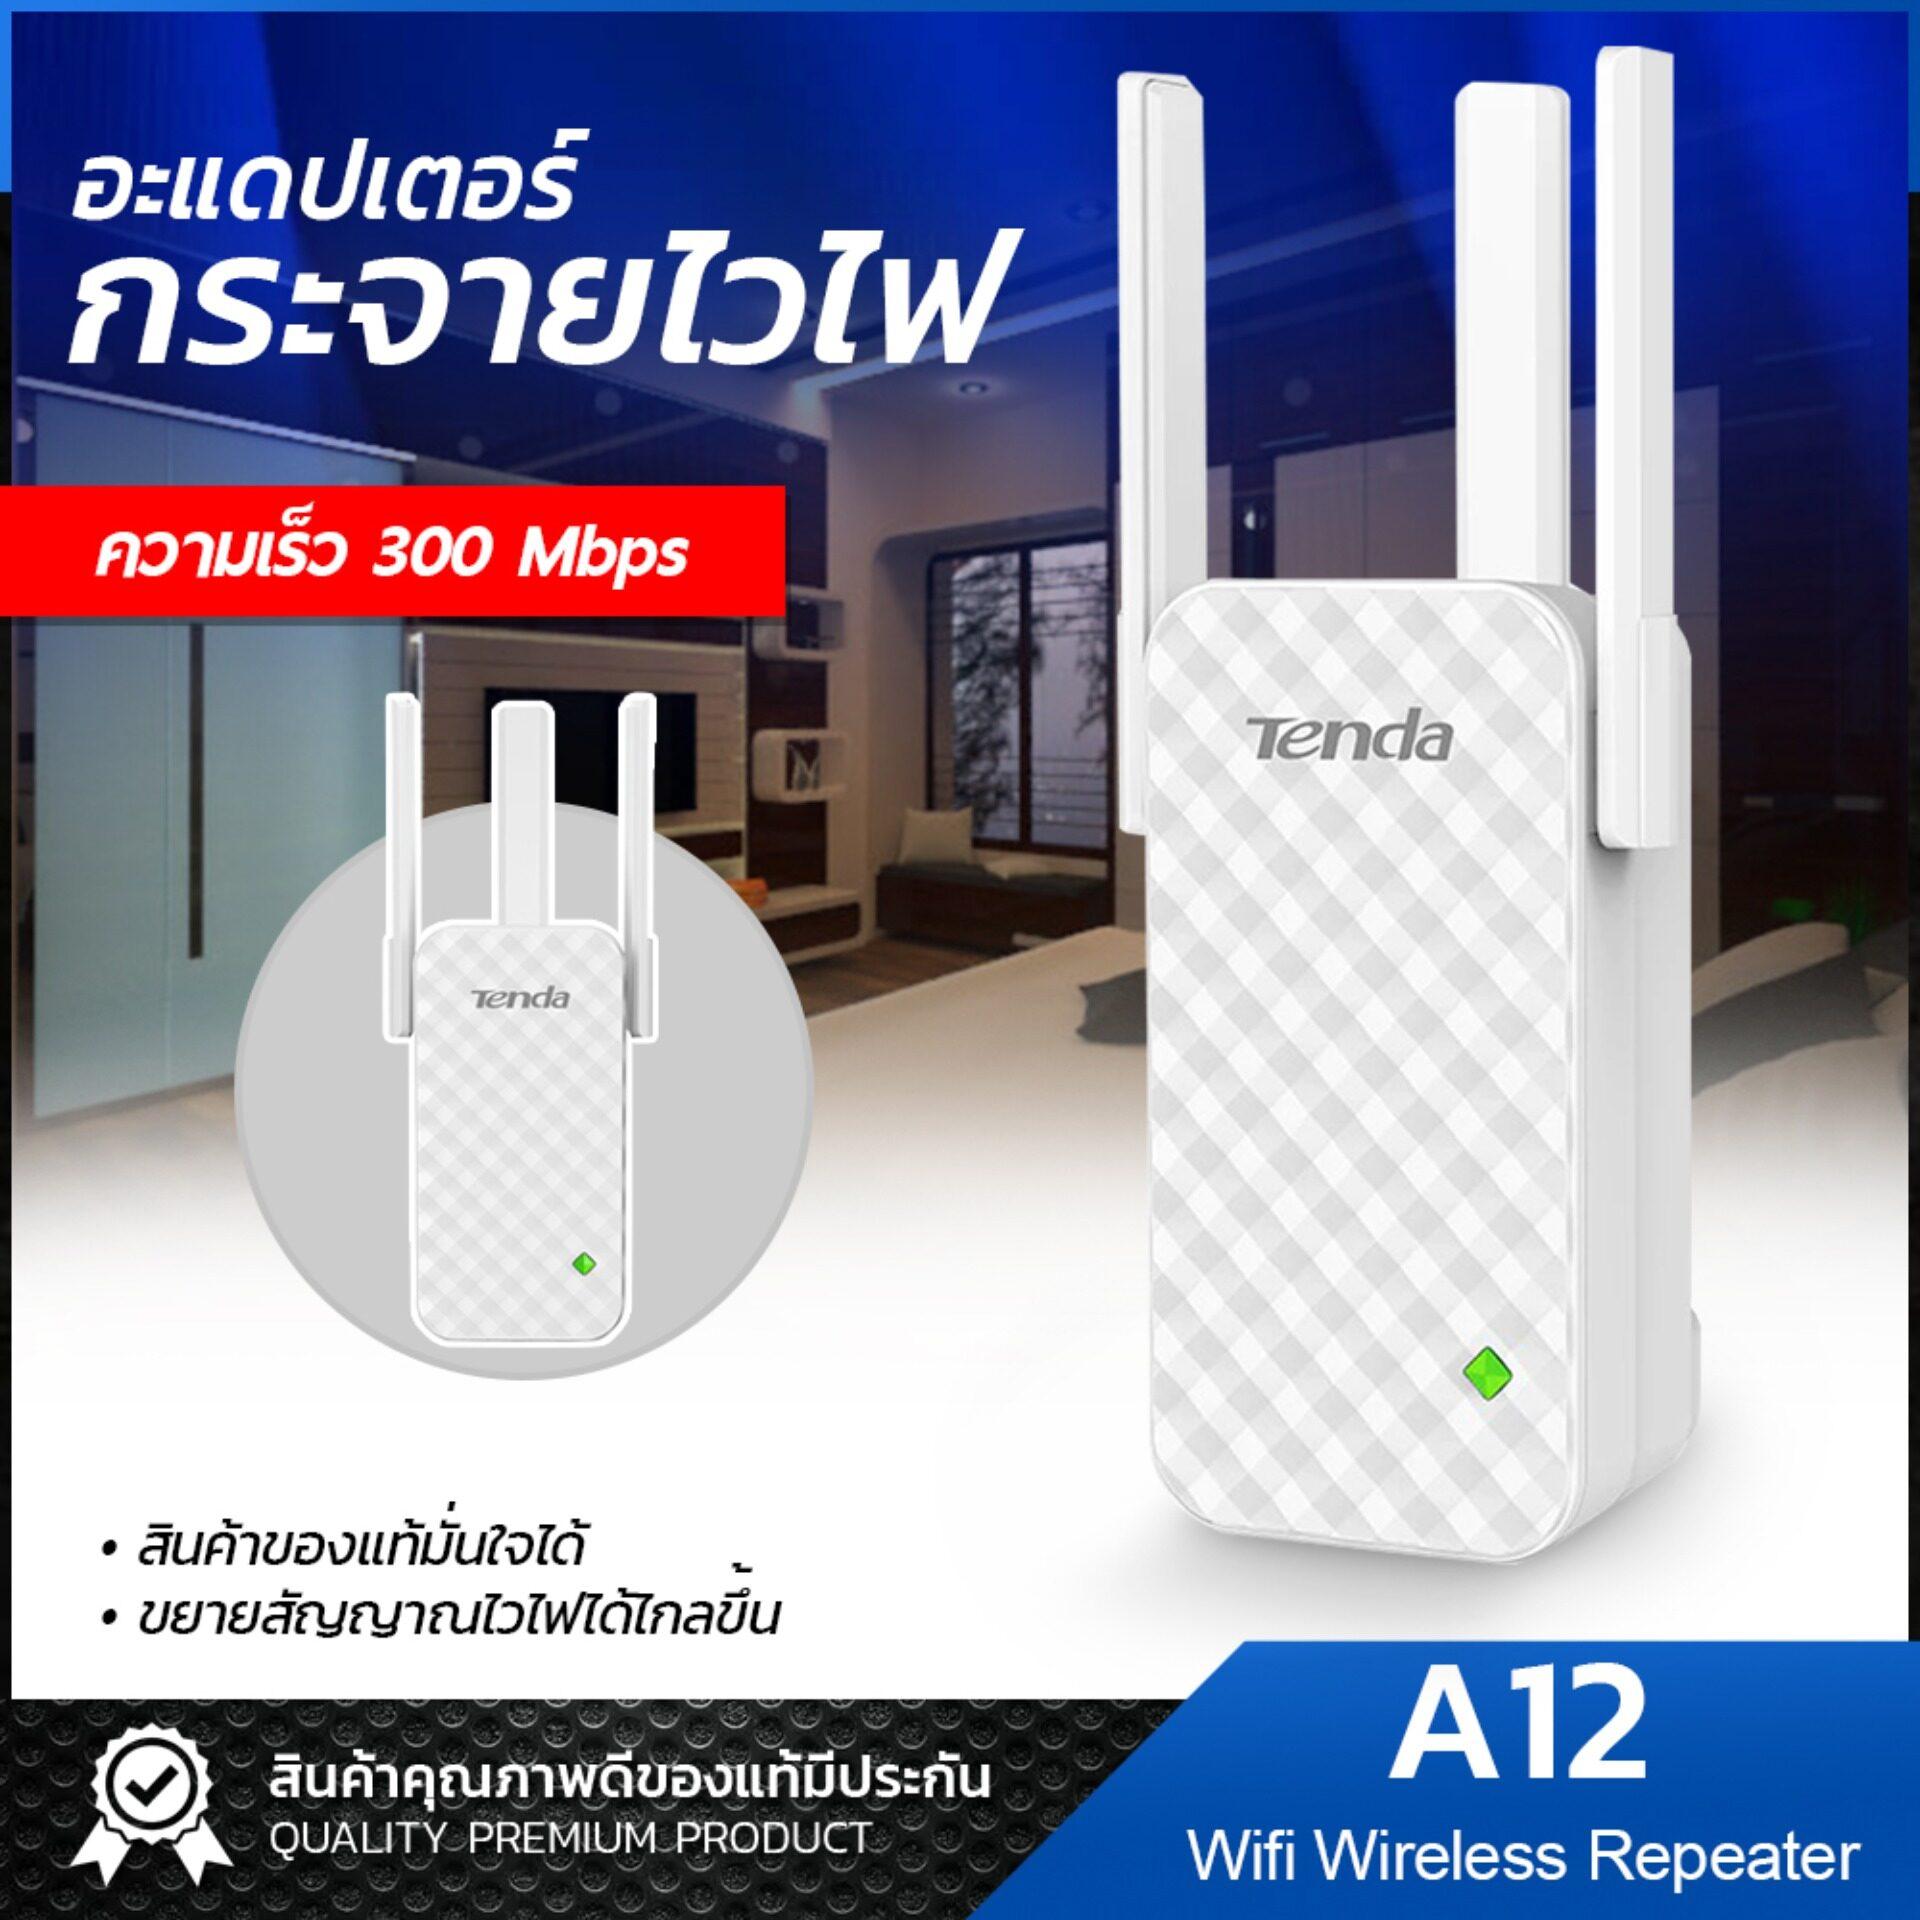 Original Tenda A12 Wireless Wifi Repeater 300 Mbps 3 เสาอากาศ Enhance Universal Wireless Range Extender, Enhance Ap Receiving Launch, High Compatible With Router ตัวขยายสัญญาณ สัญญาณทั่วถึง ติดตั้งง่าย พร้อมคู่มือภาษาไทย / Car Kit Store.